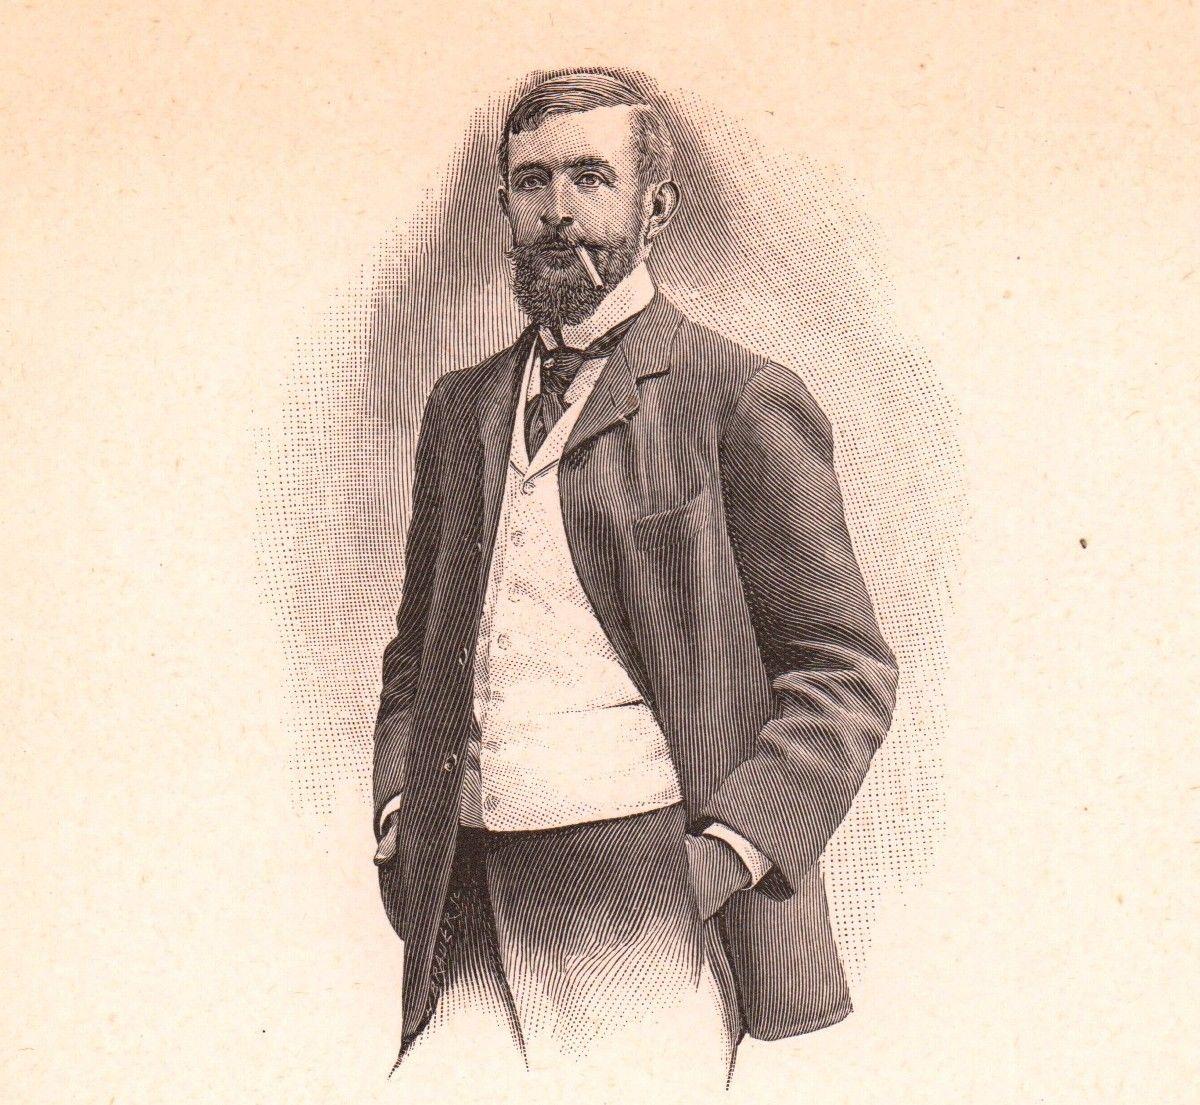 Armand Dayot